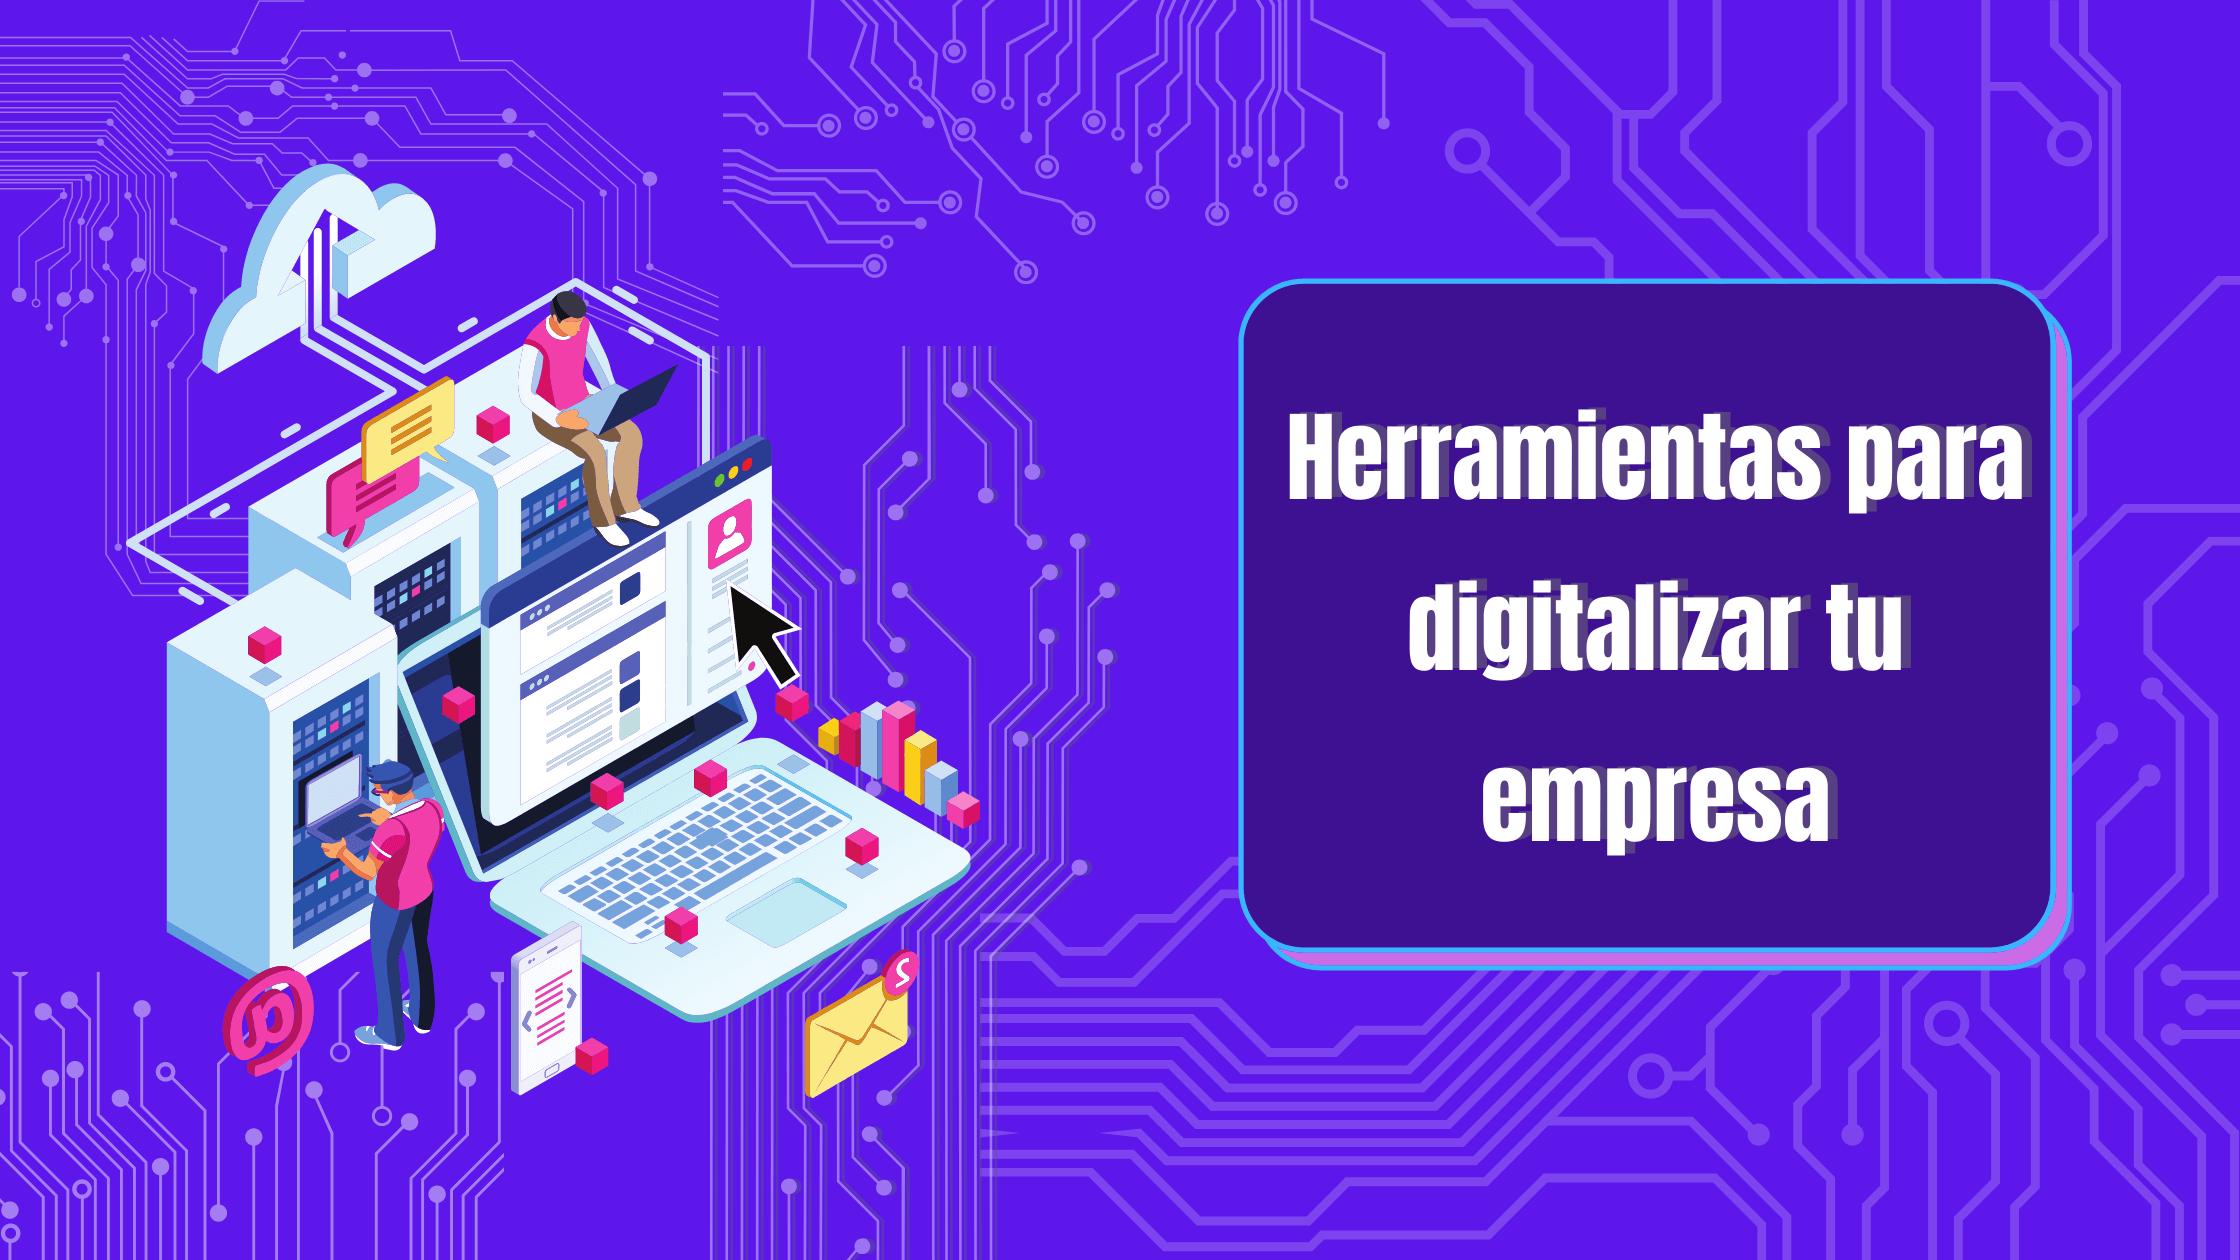 Herramientas para digitalizar tu empresa